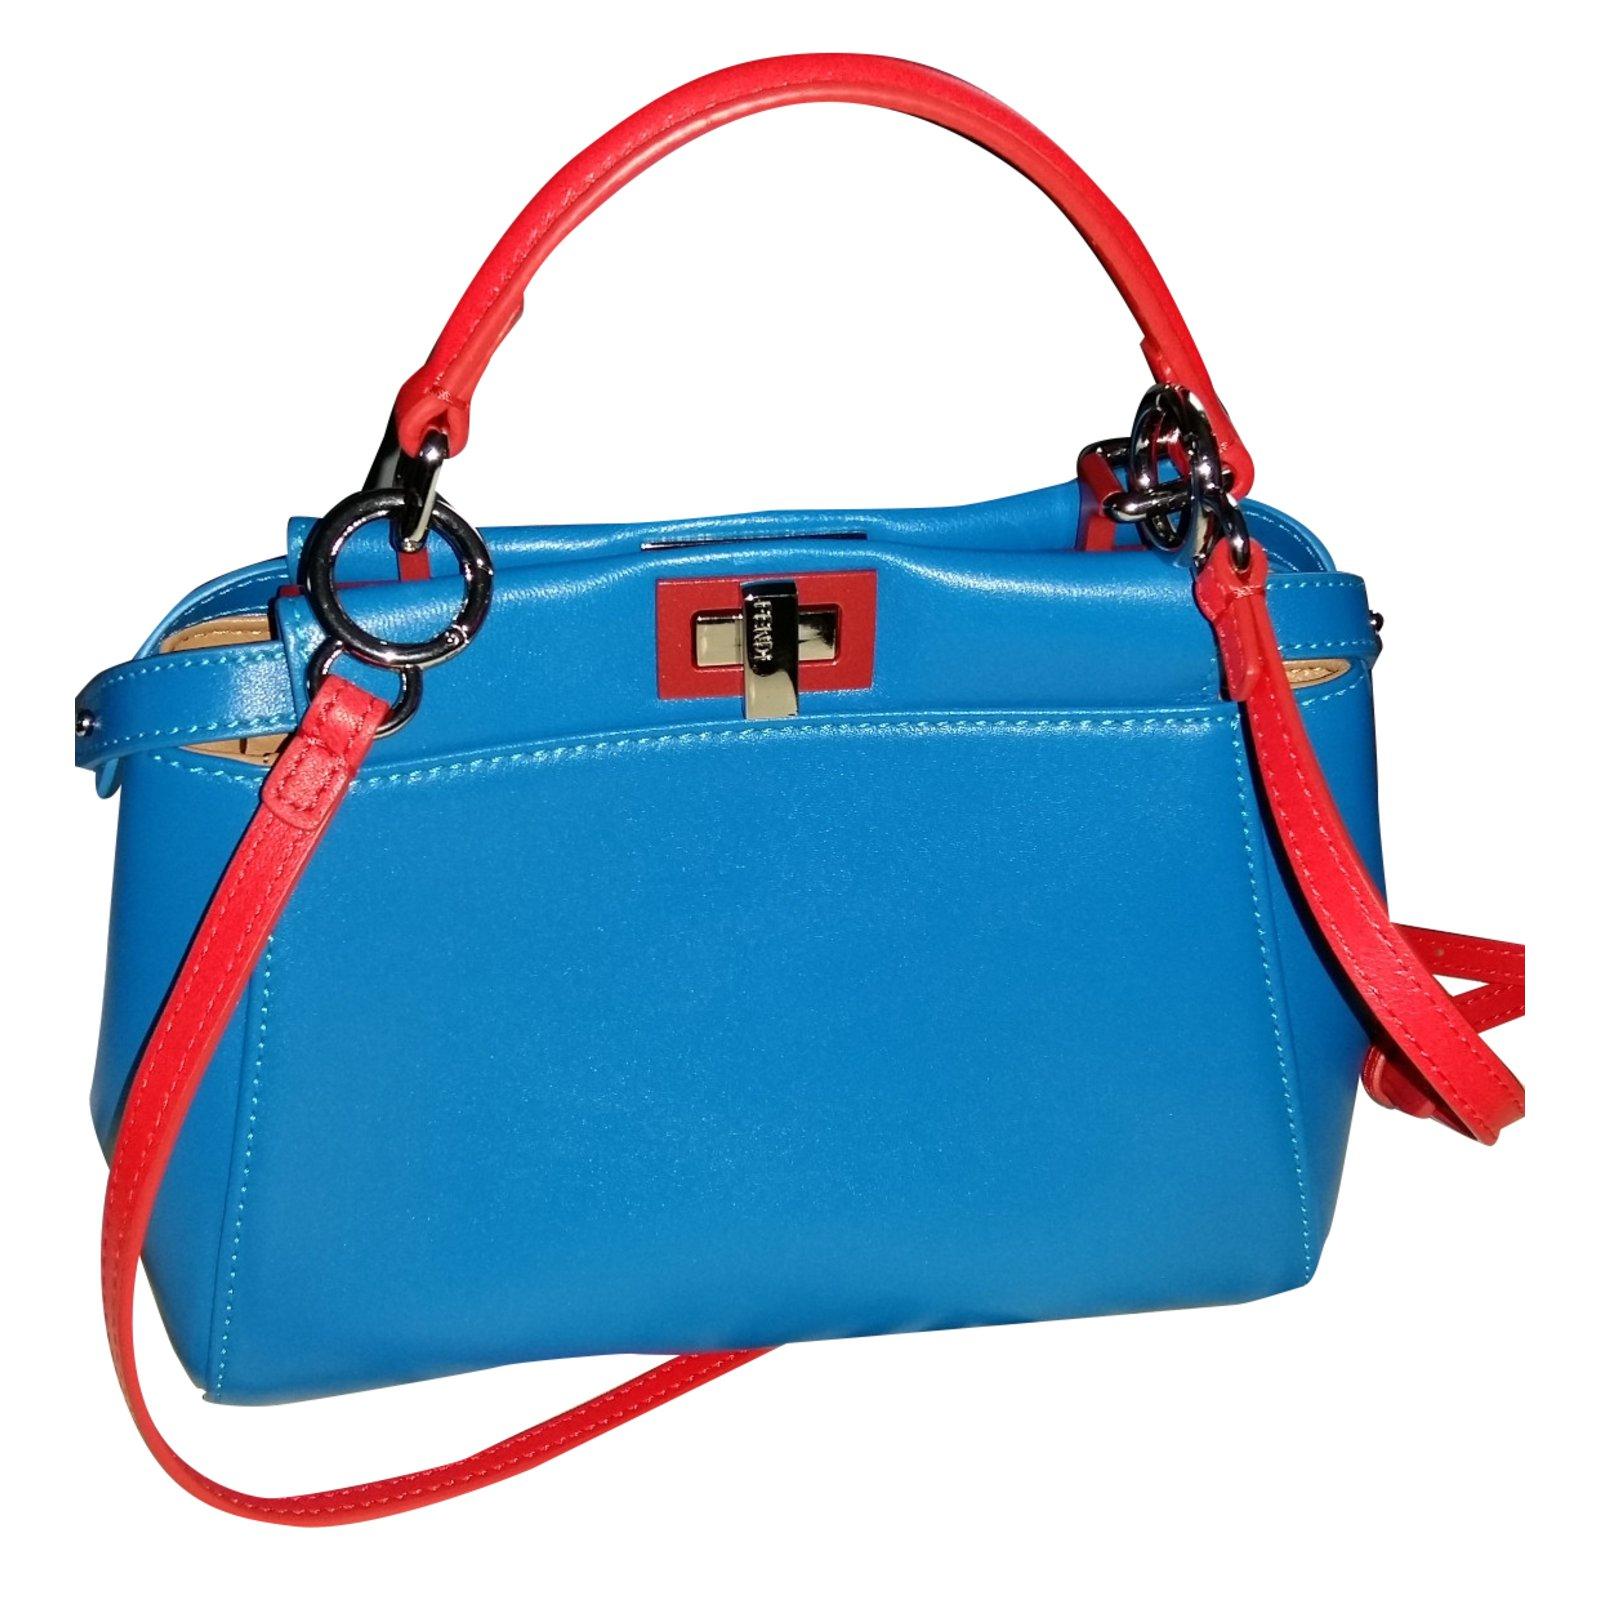 69fde4b87d Fendi Mini Peekaboo Handbags Leather Blue ref.30898 - Joli Closet